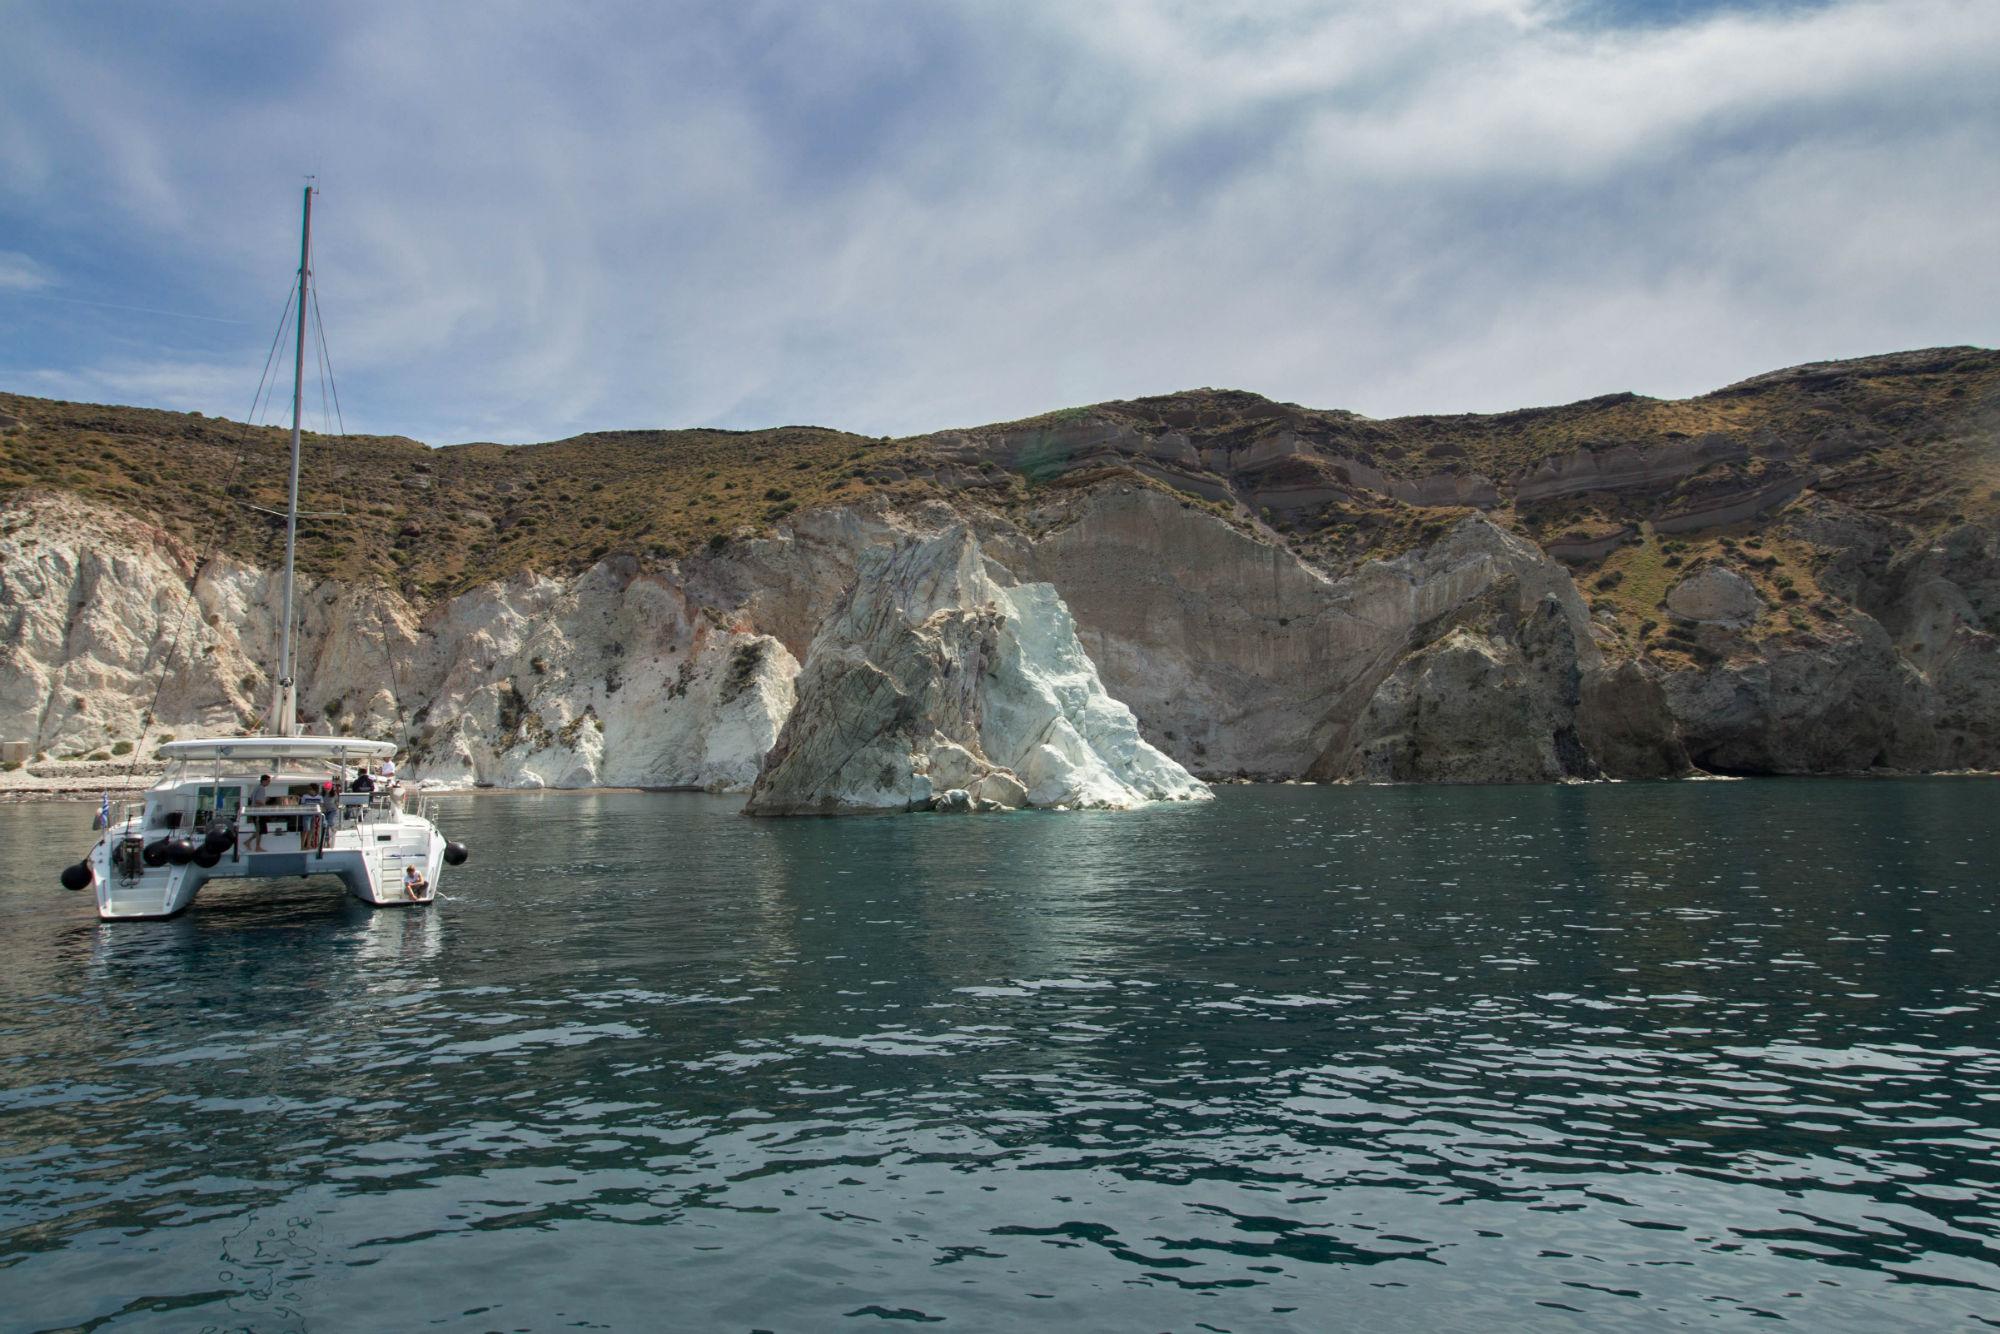 The Rear Of A Sailboat Anchored Near The White Beach